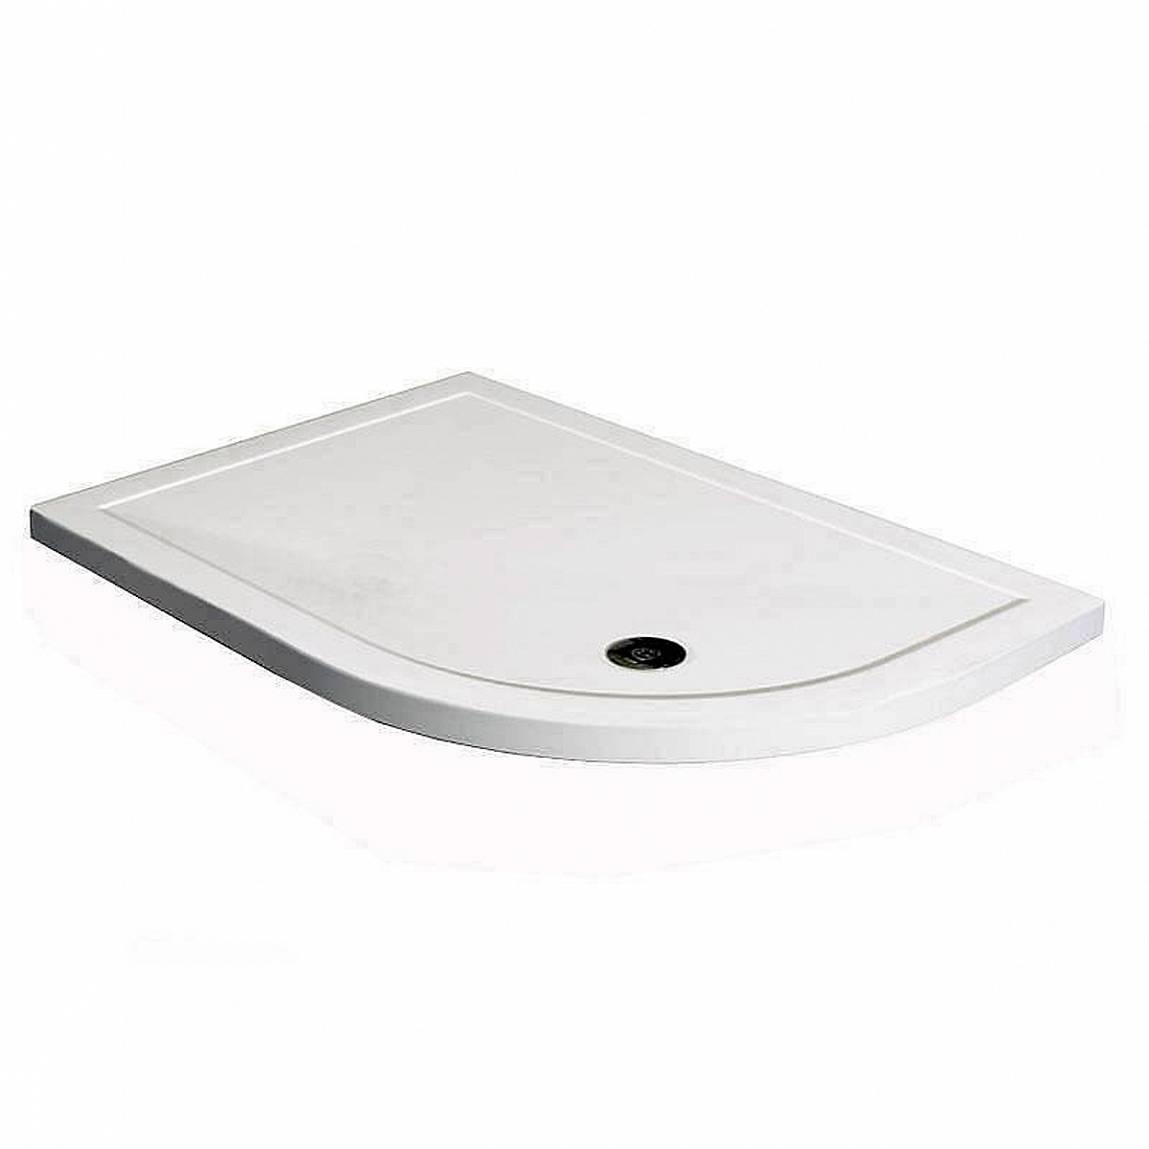 Image of Offset Quadrant Stone Shower Tray 1200 x 800 RH